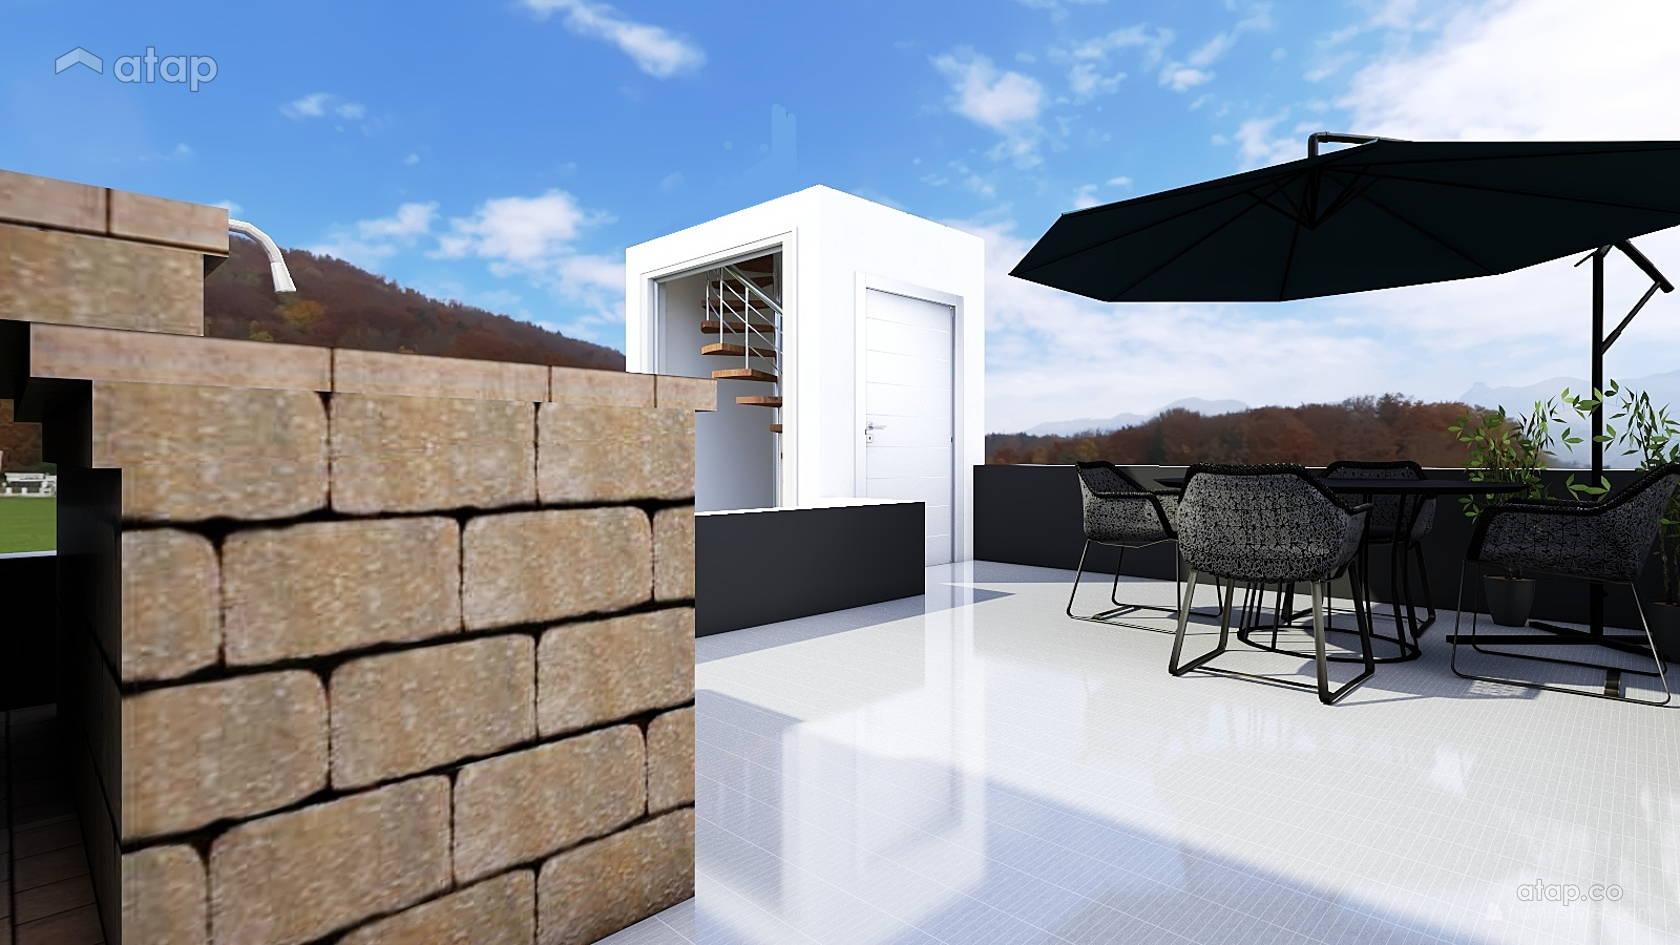 Industrial Minimalistic Balcony Garden Terrace Design Ideas